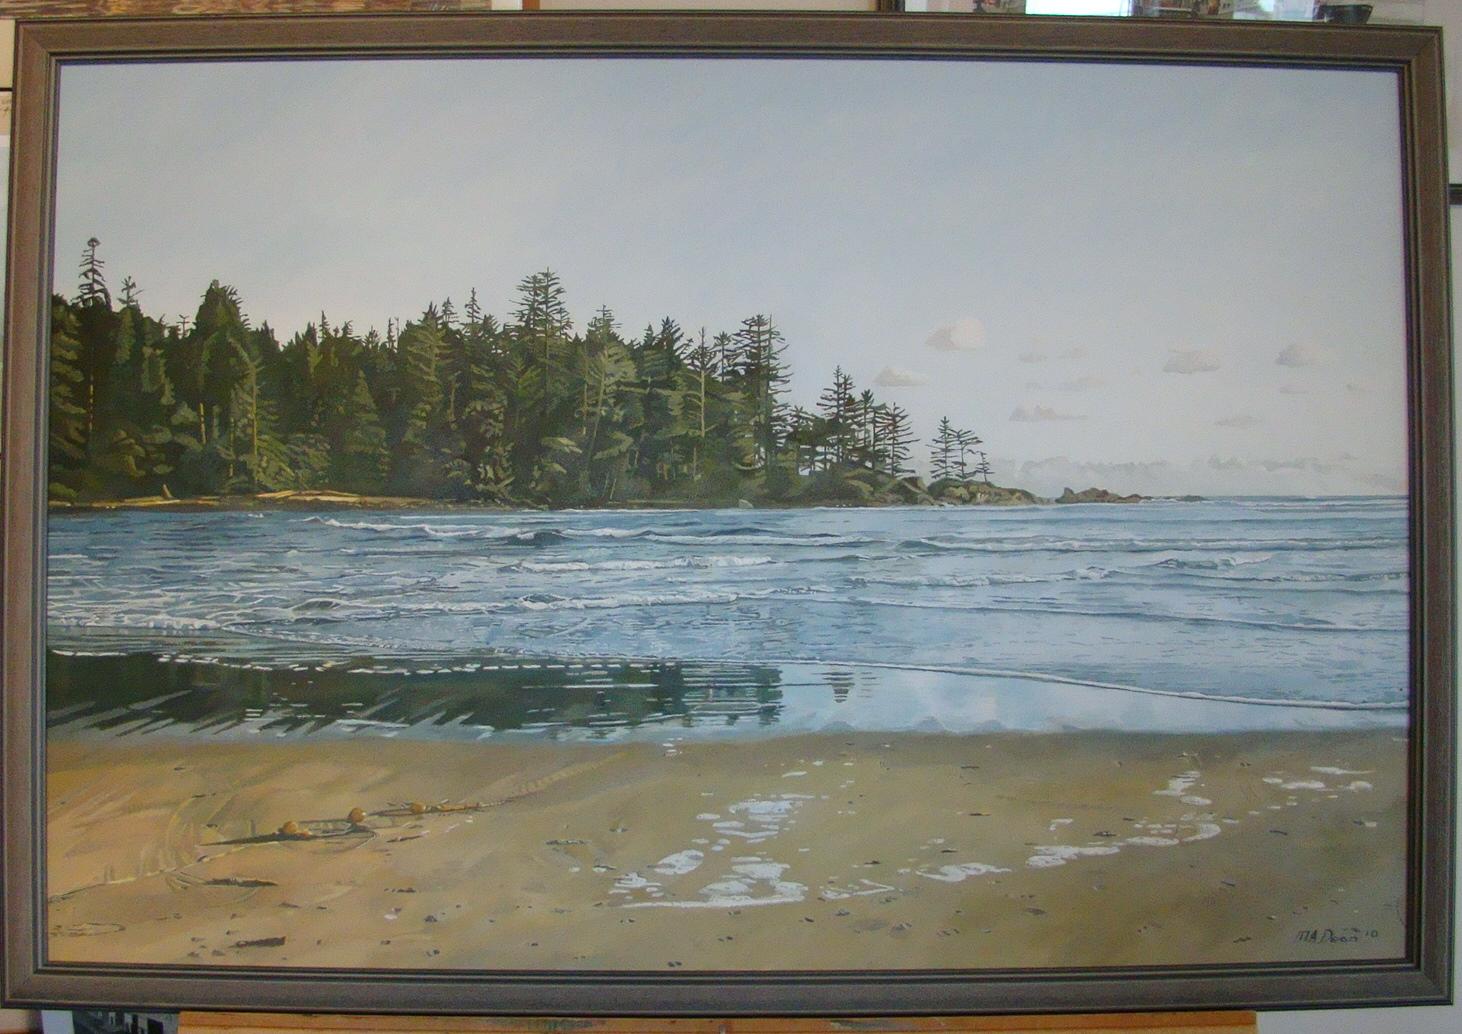 Beach at Raft Cove